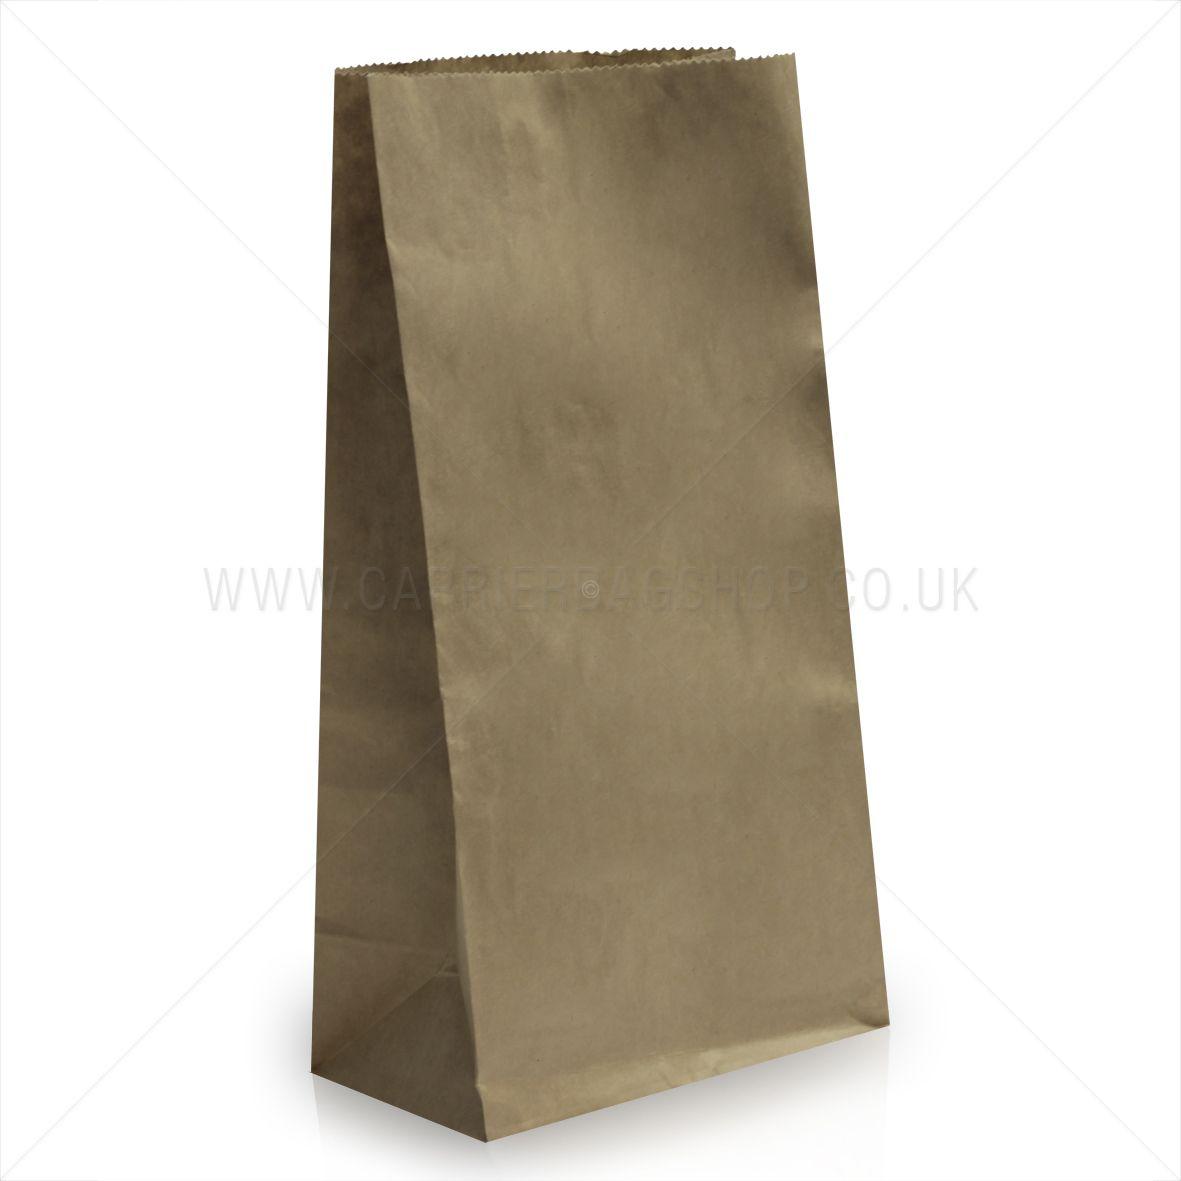 2a210adf778 Block Bottom Brown Kraft Paper Bags